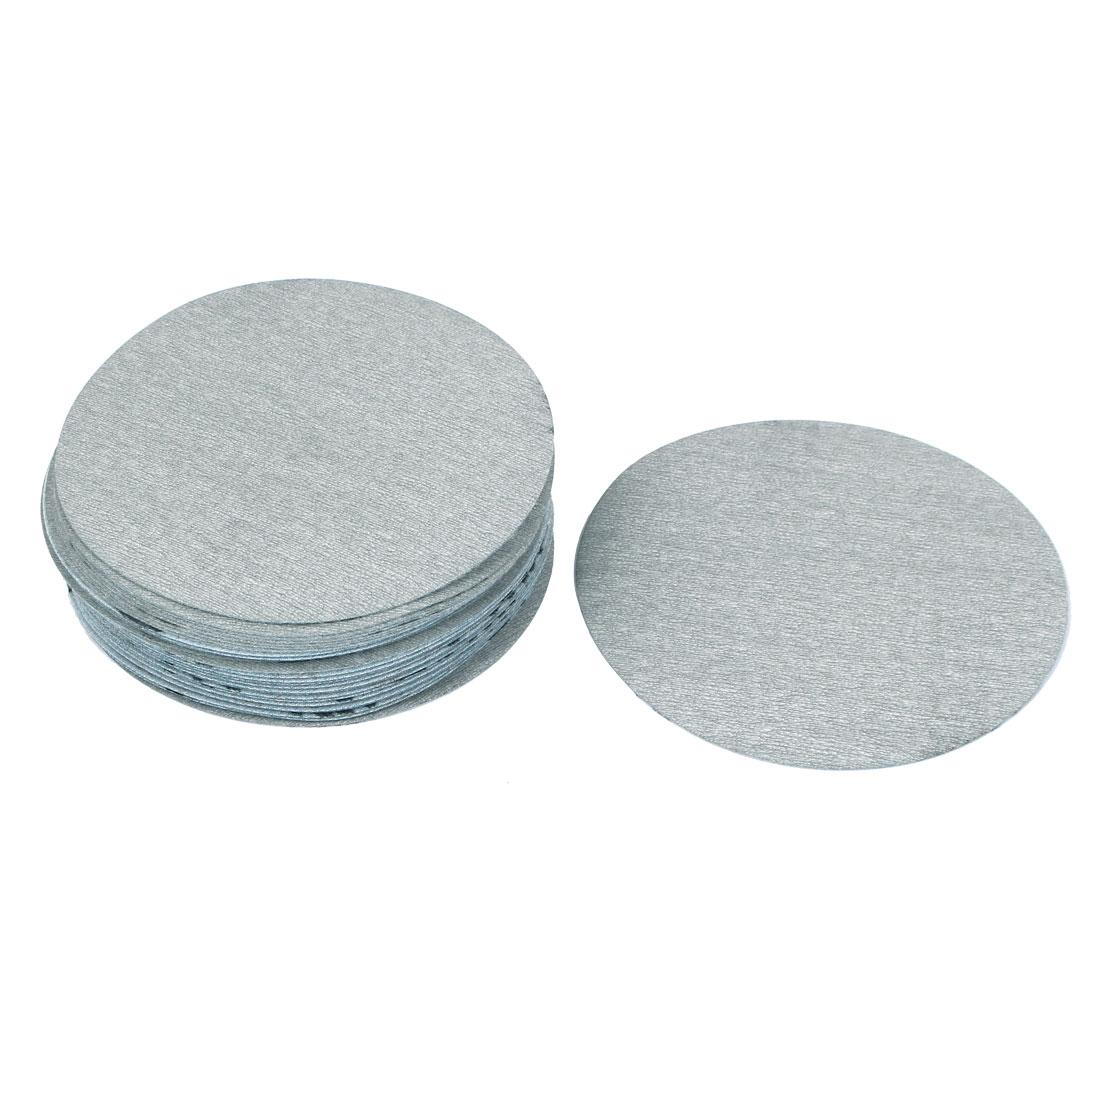 "5"" Dia Polishing Round Dry Abrasive Sanding Sandpaper Sheet Disc 1000 Grit 30pcs"